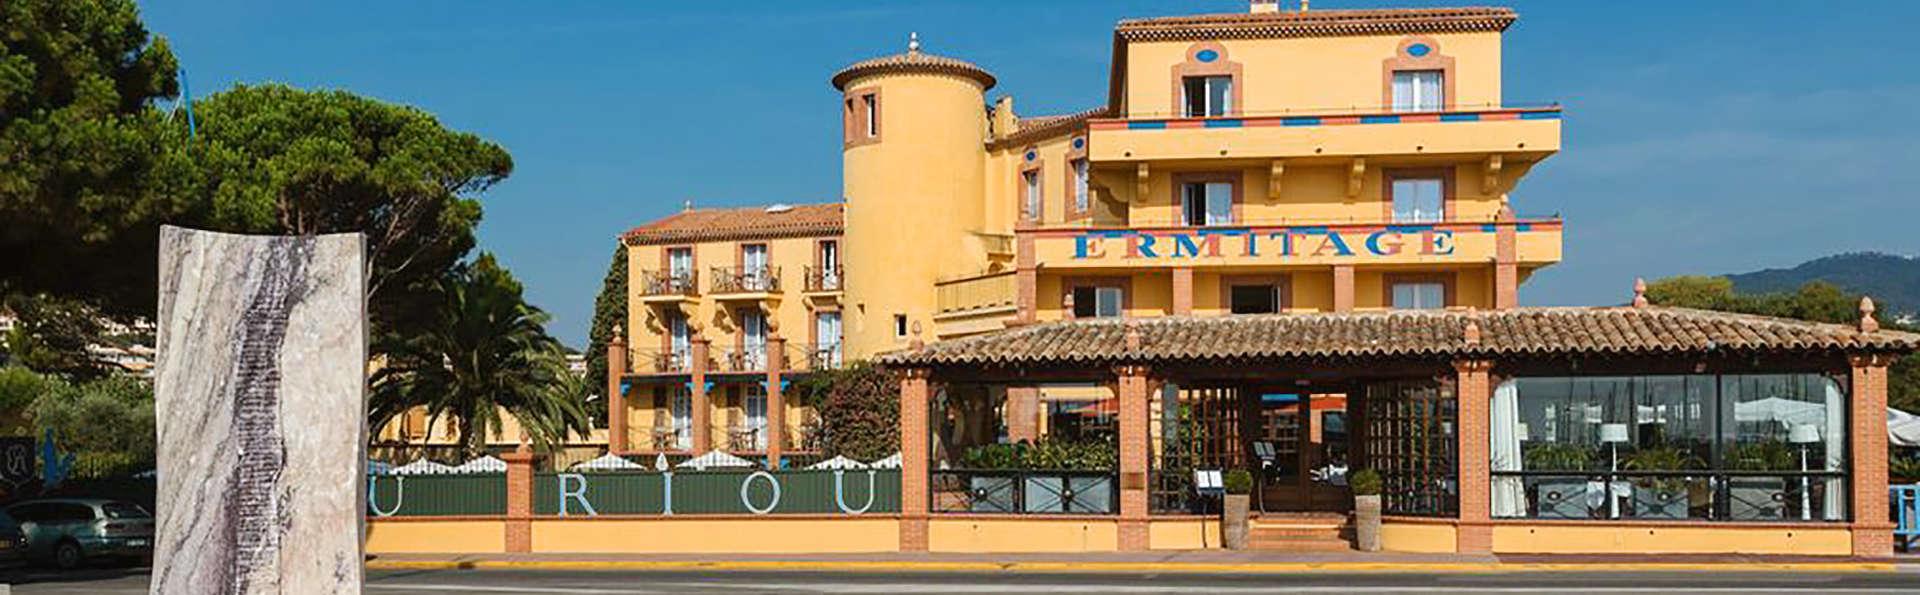 Ermitage de l'Oasis - Cannes Mandelieu - EDIT_Fachada_1.jpg